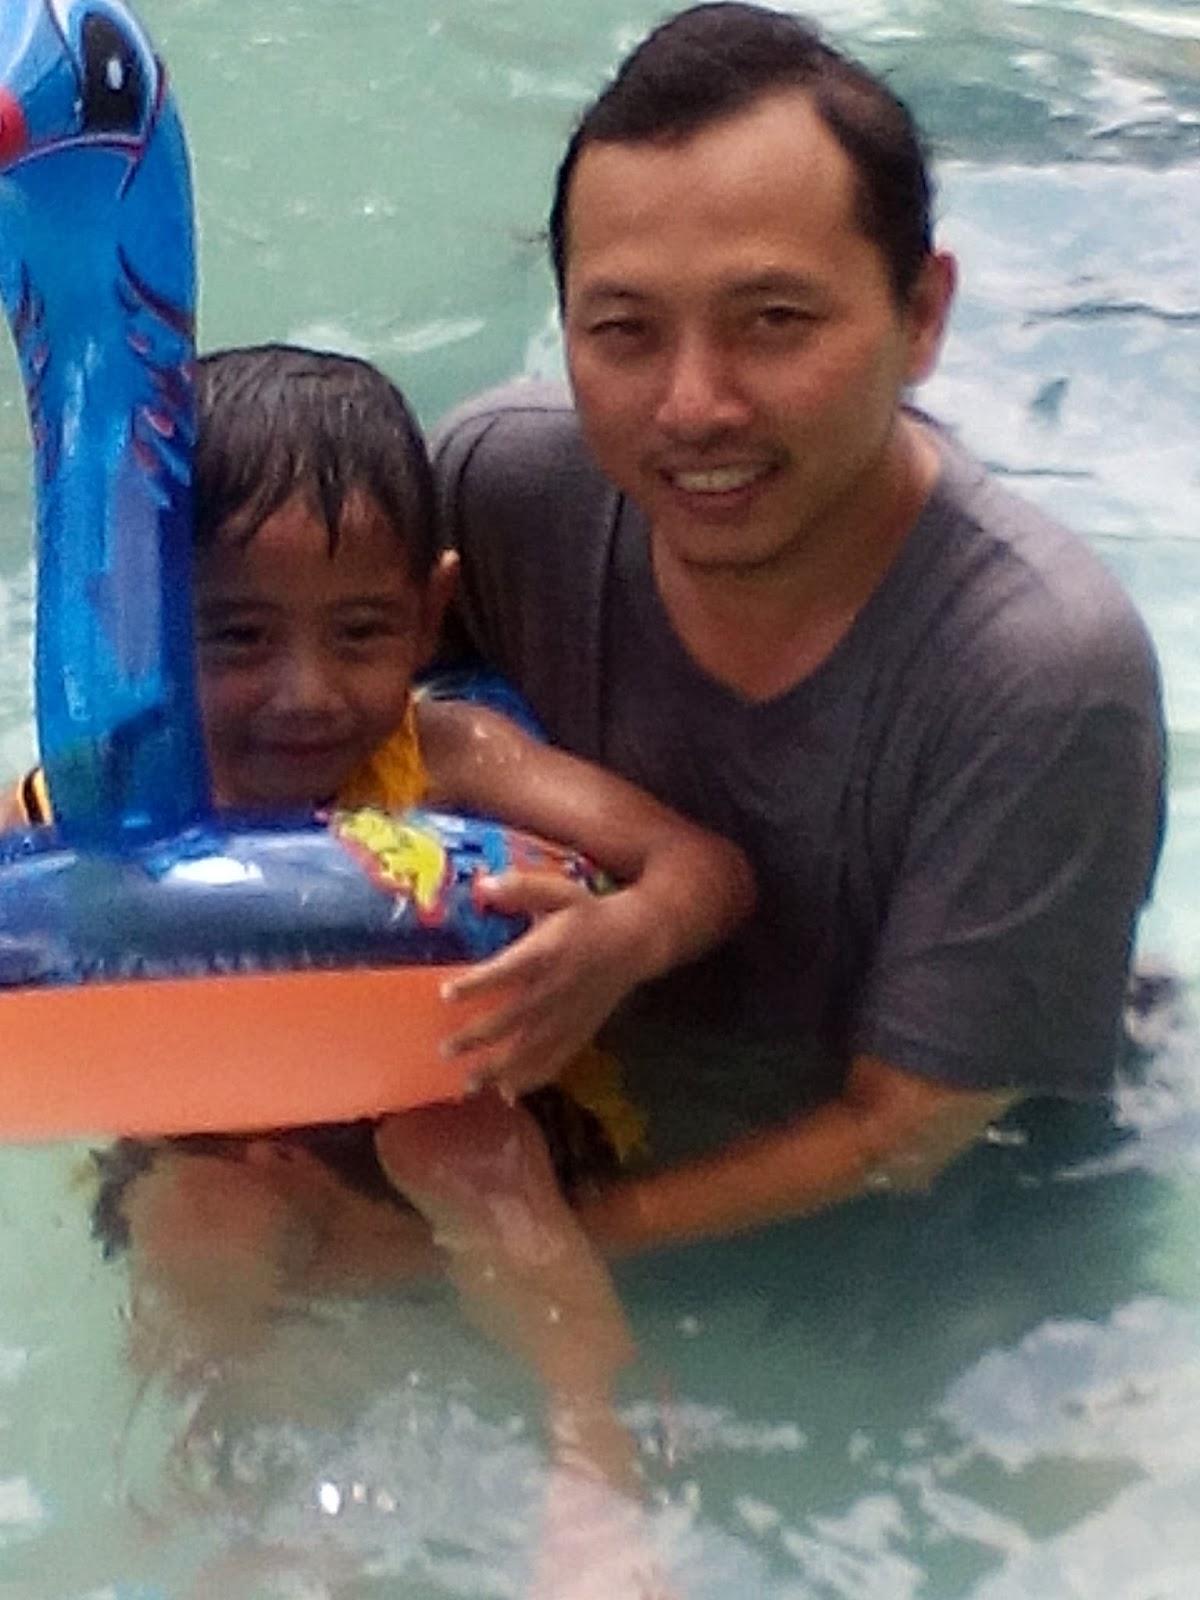 Nodiwa Wisata Edukasi Kampung Coklat Water Park Sumber Udel Umumnya